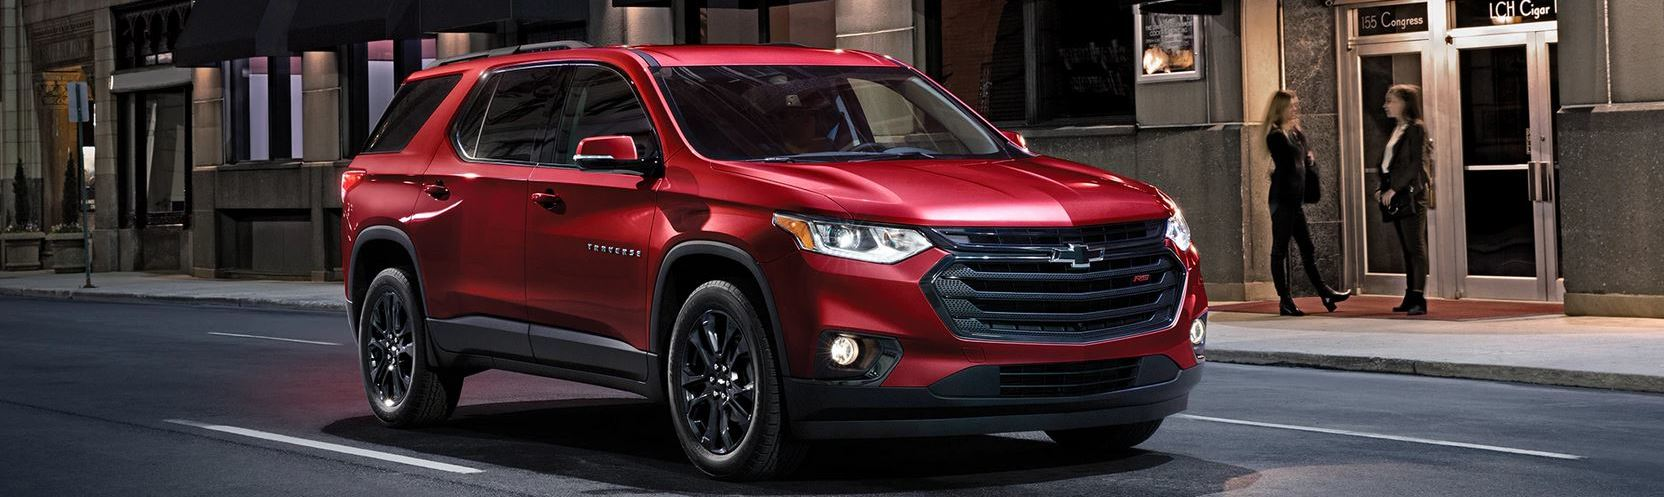 2020 Chevrolet Traverse for Sale near Southfield, MI